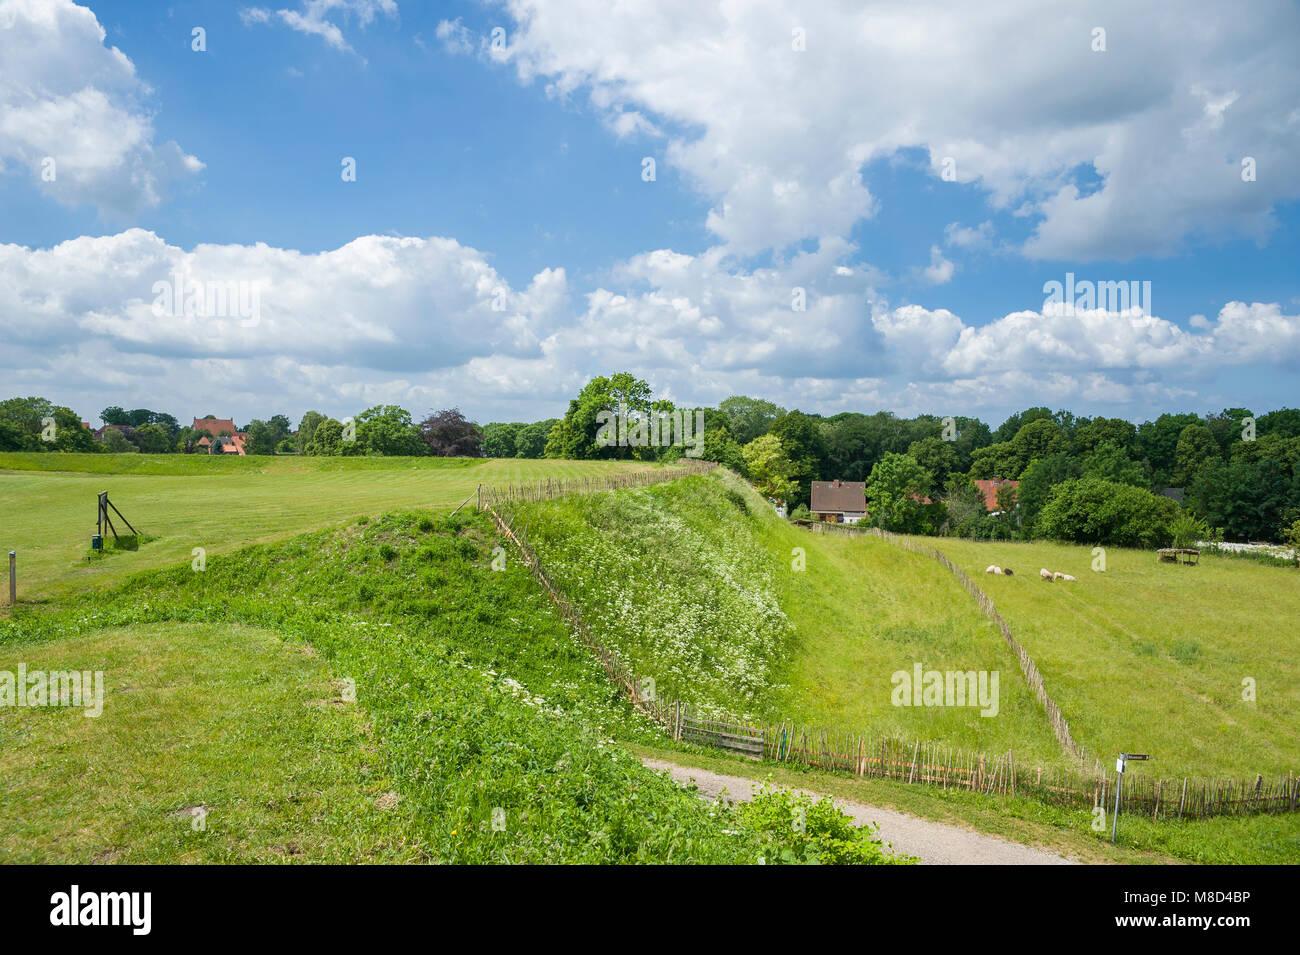 Historical slavic ringwall, Oldenburg in Holstein, Baltic Sea, Schleswig-Holstein, Germany, Europe - Stock Image